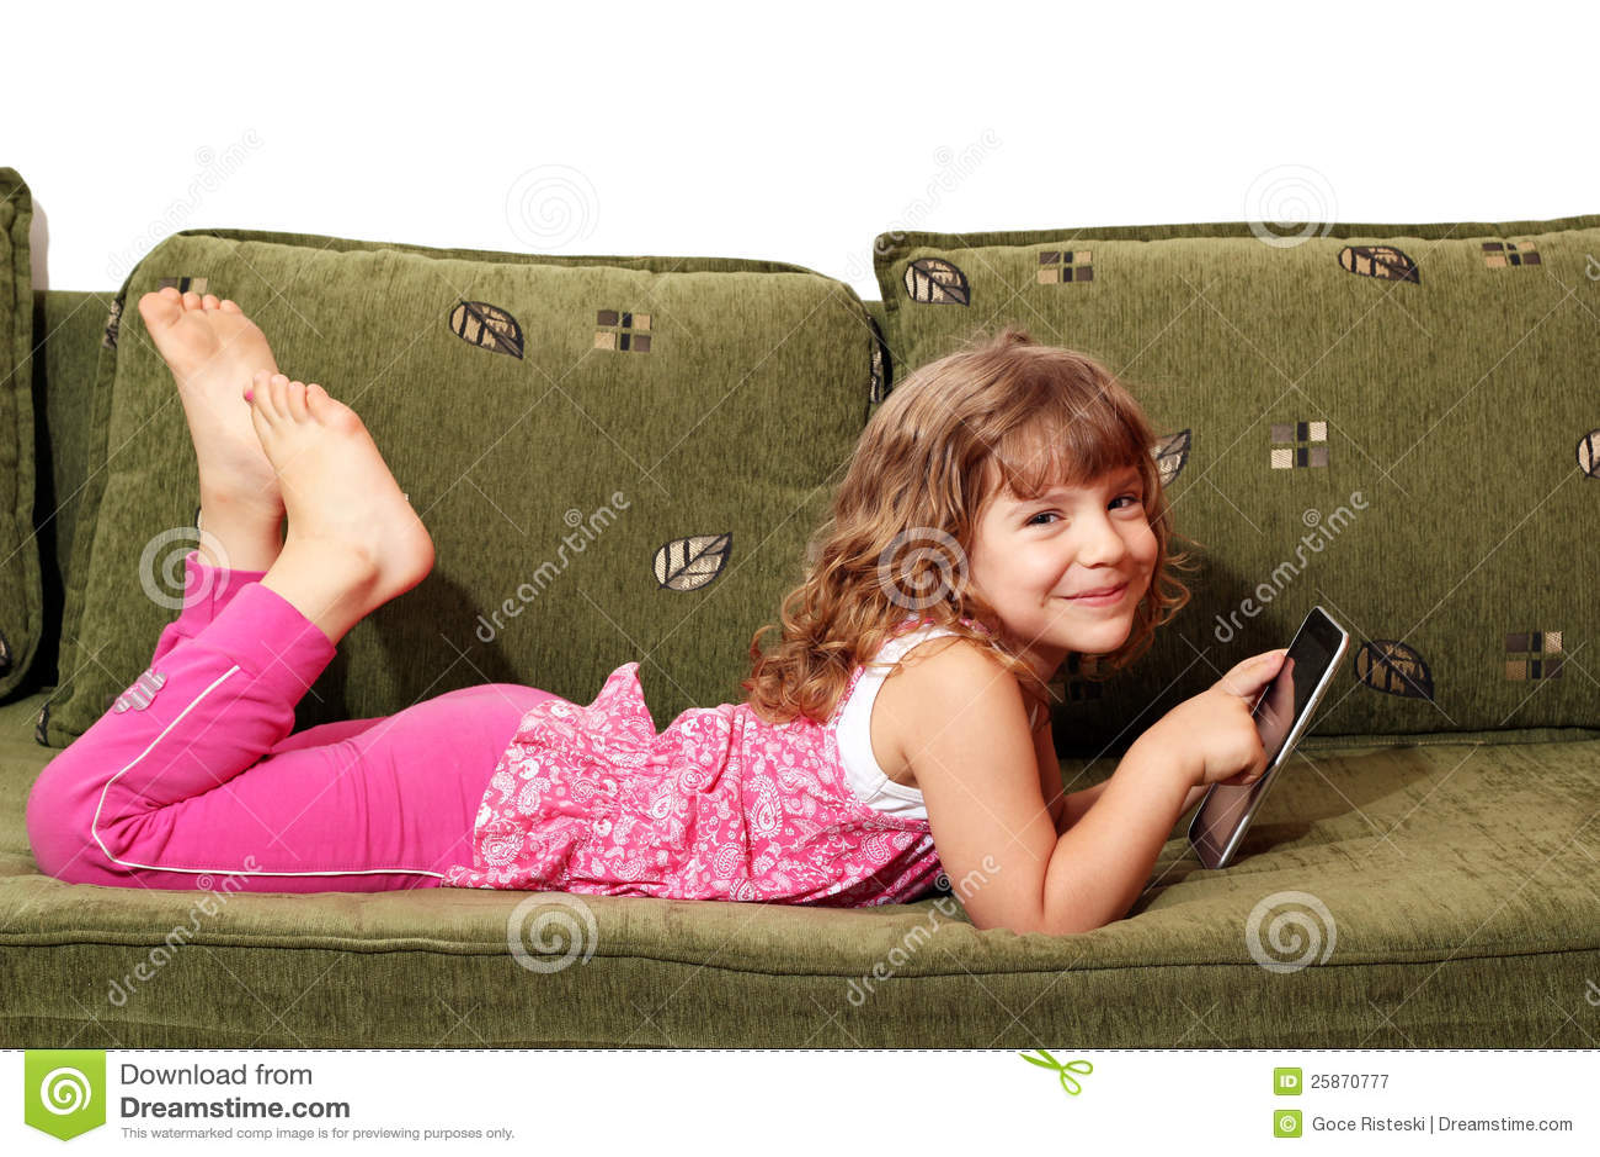 little girl lying Little girl lying on bed with tablet